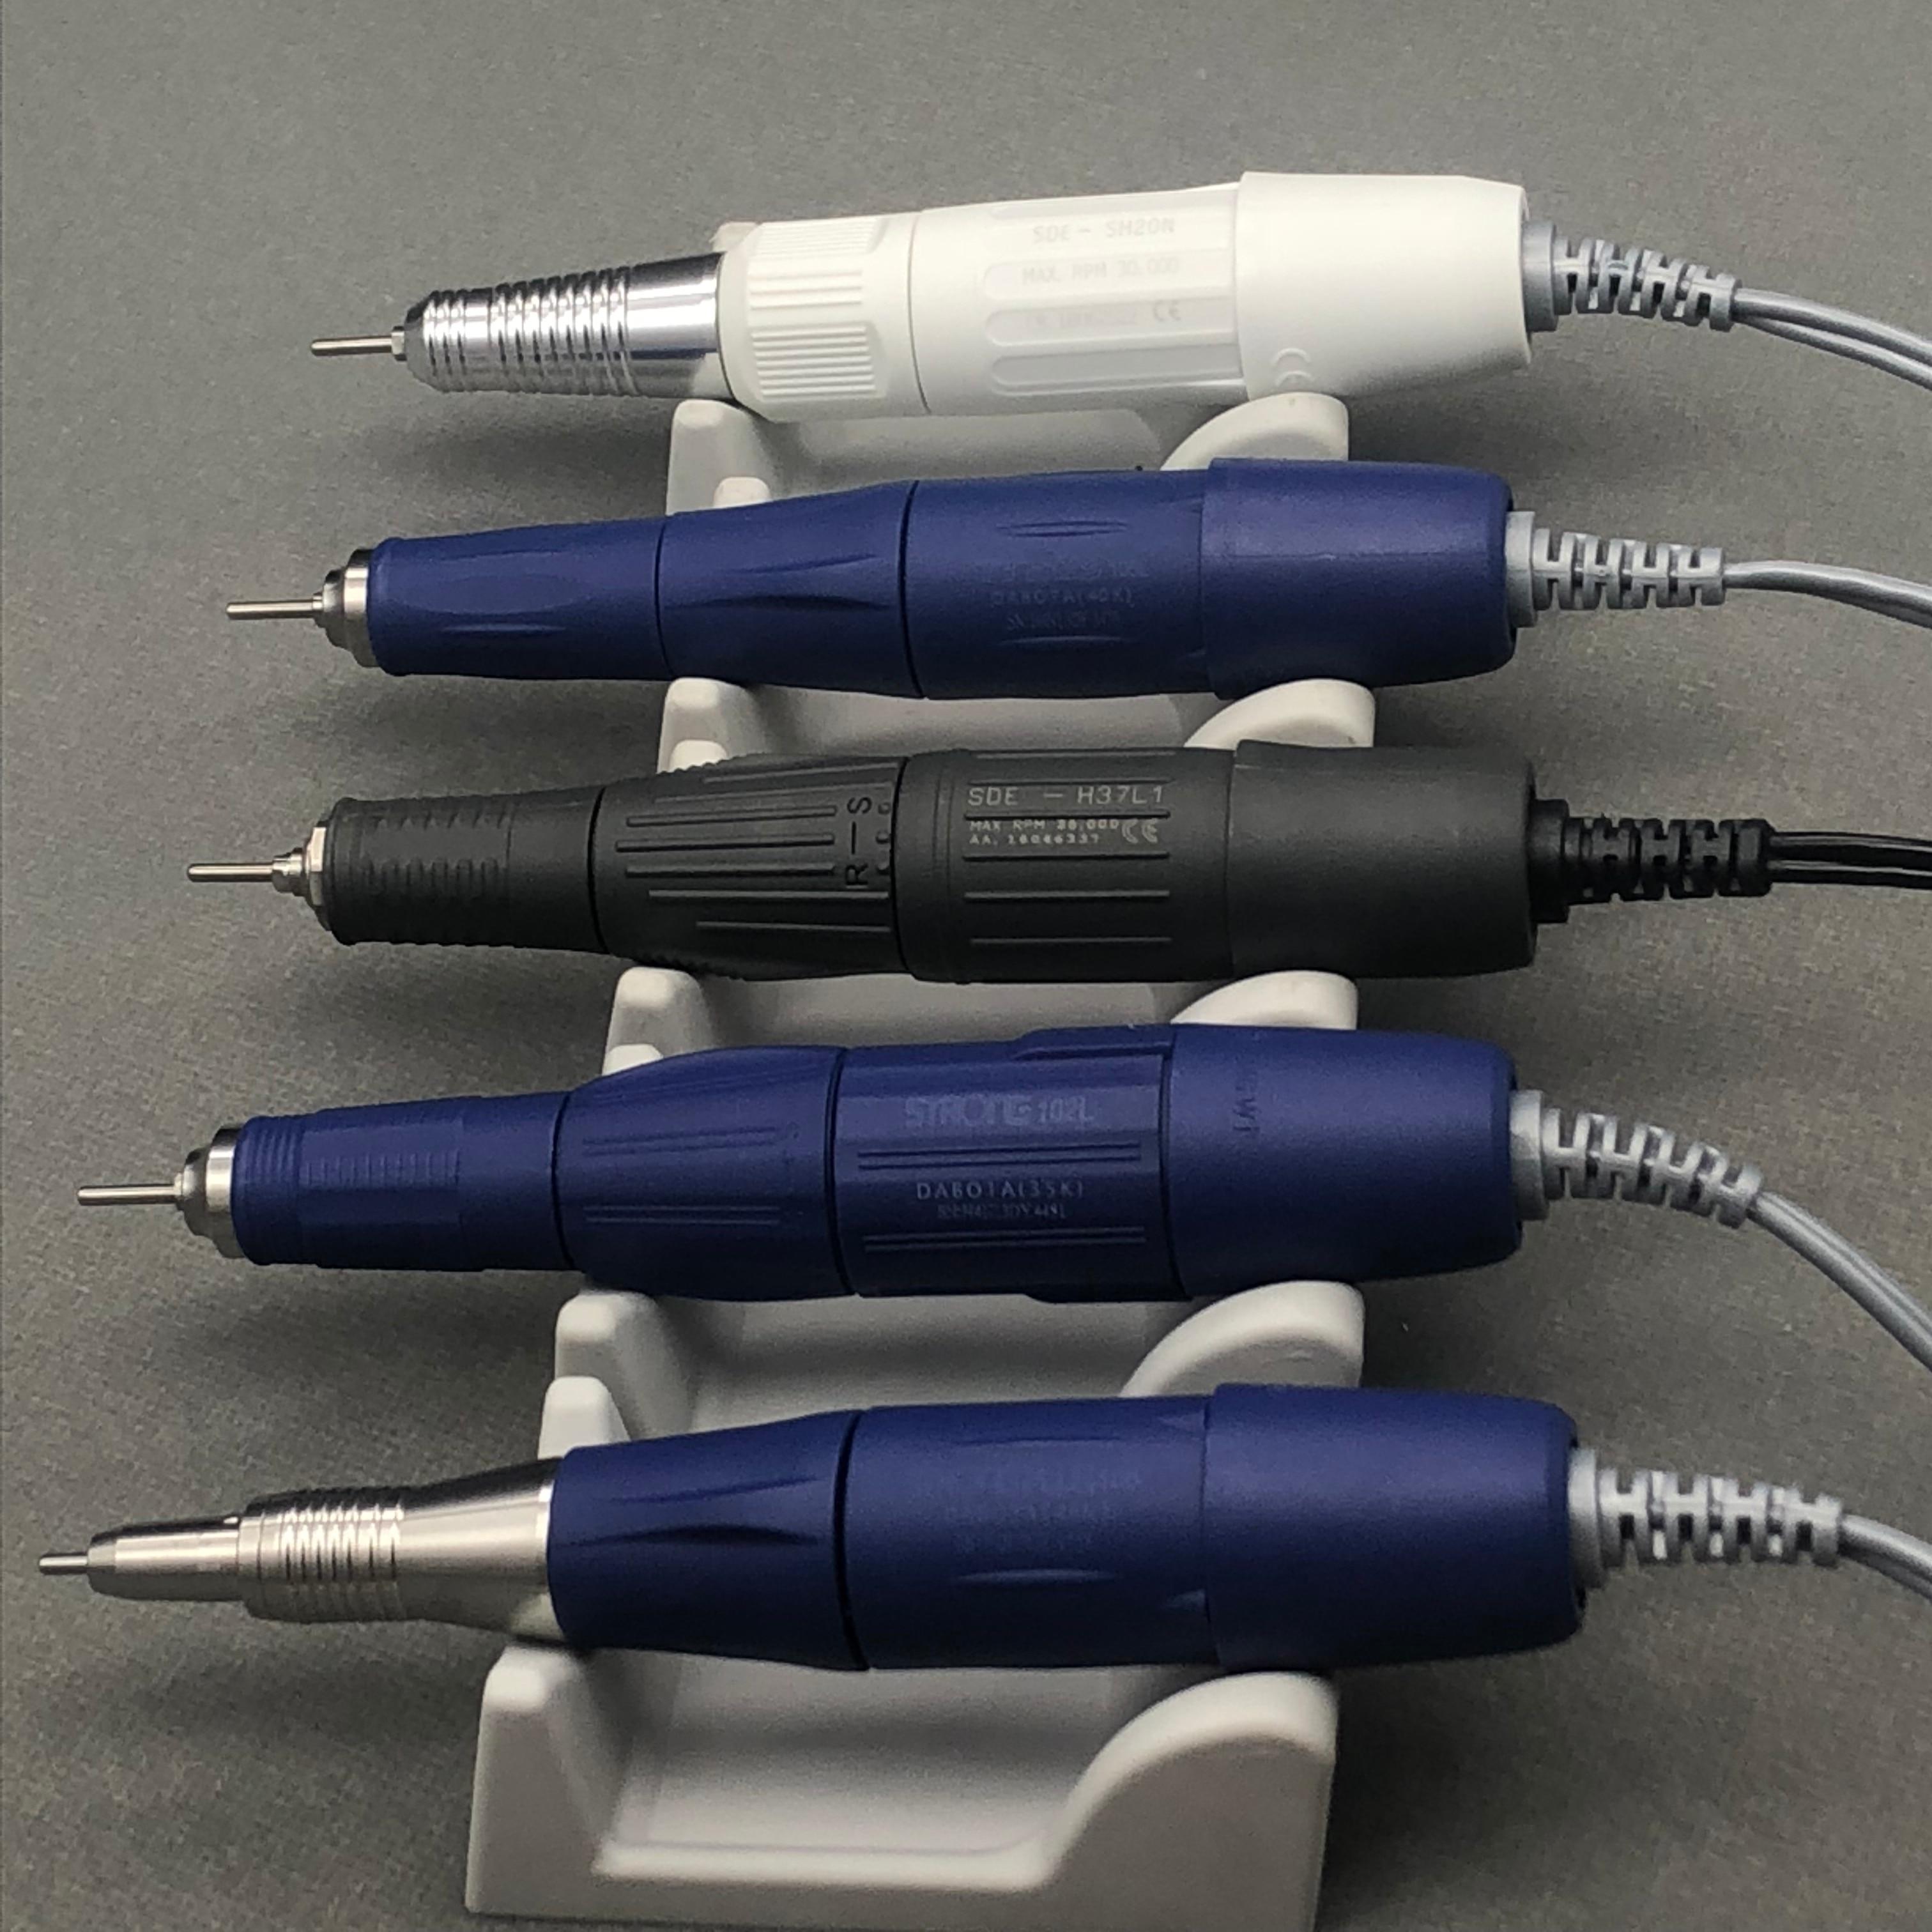 30K y 35K y 45K RPM Material odontológico Marathon Micromotor de pieza 2,35mm 102L 105L PLUS 105 H37L1 SH20N